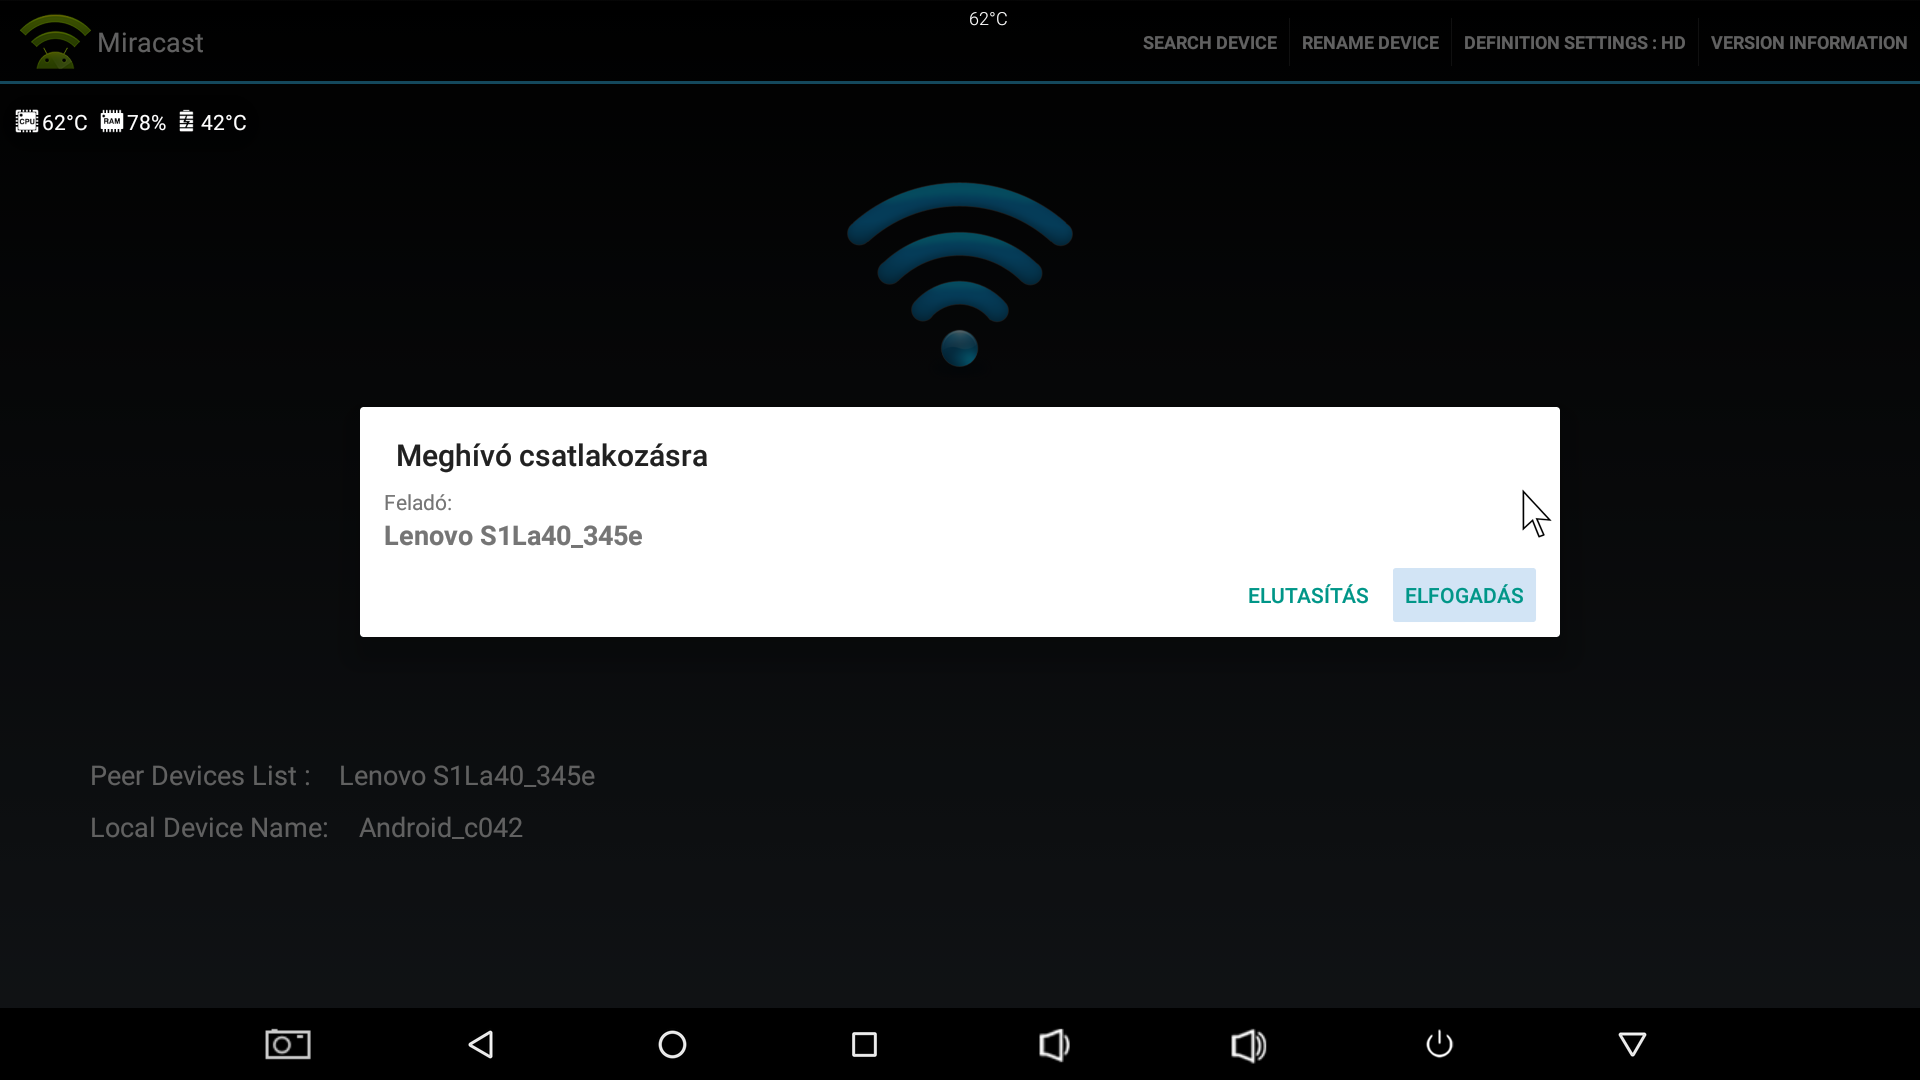 screenshot_20170803-115511.png